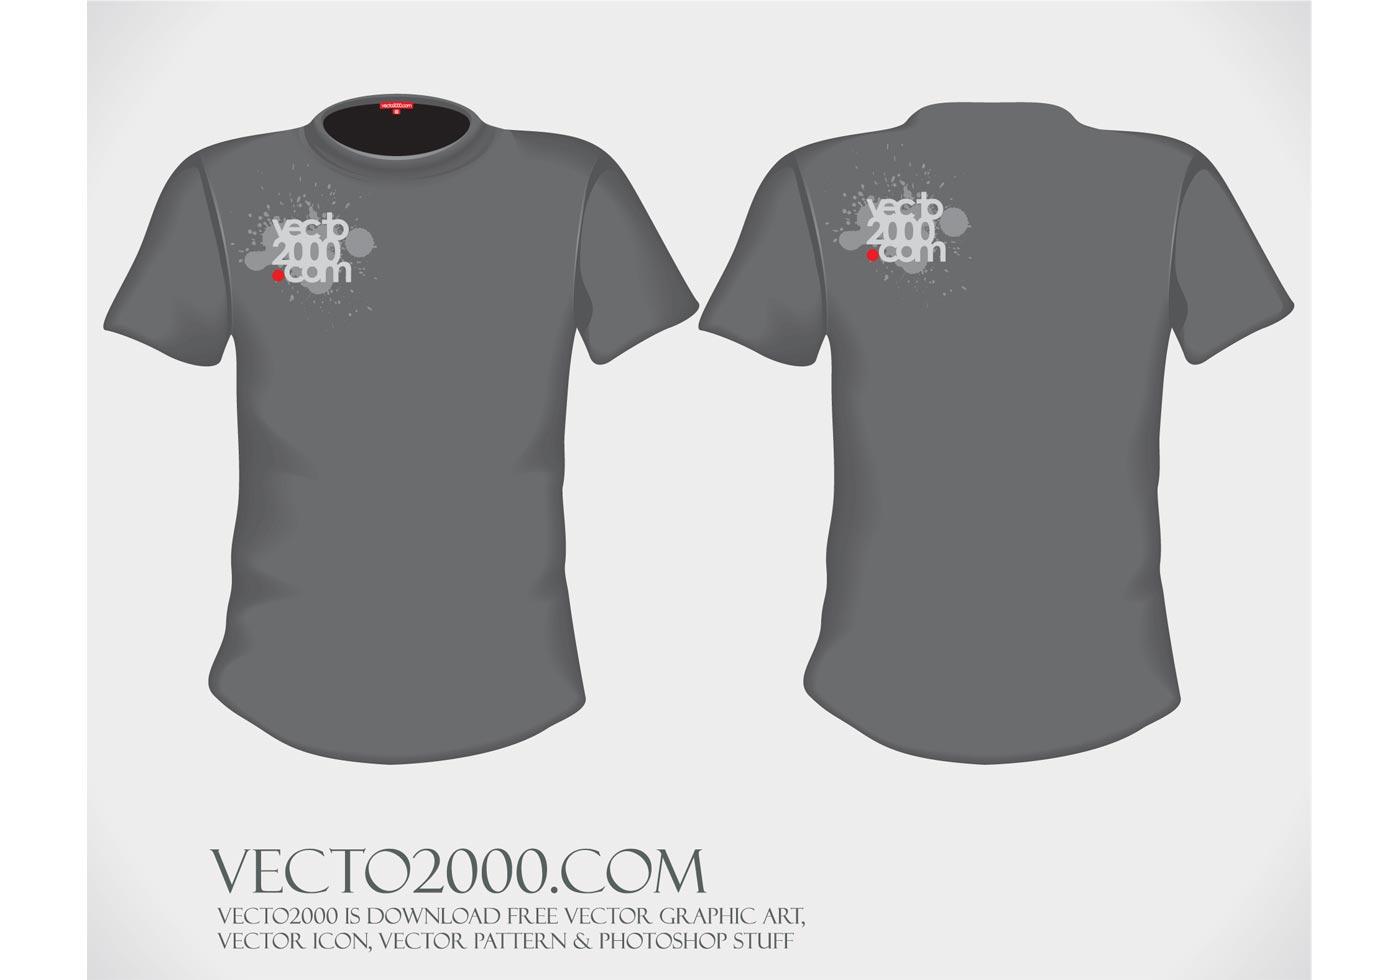 Black t shirt vector ai - Black T Shirt Template For Photoshop Psd Tshirt Vector Black Shirt Download